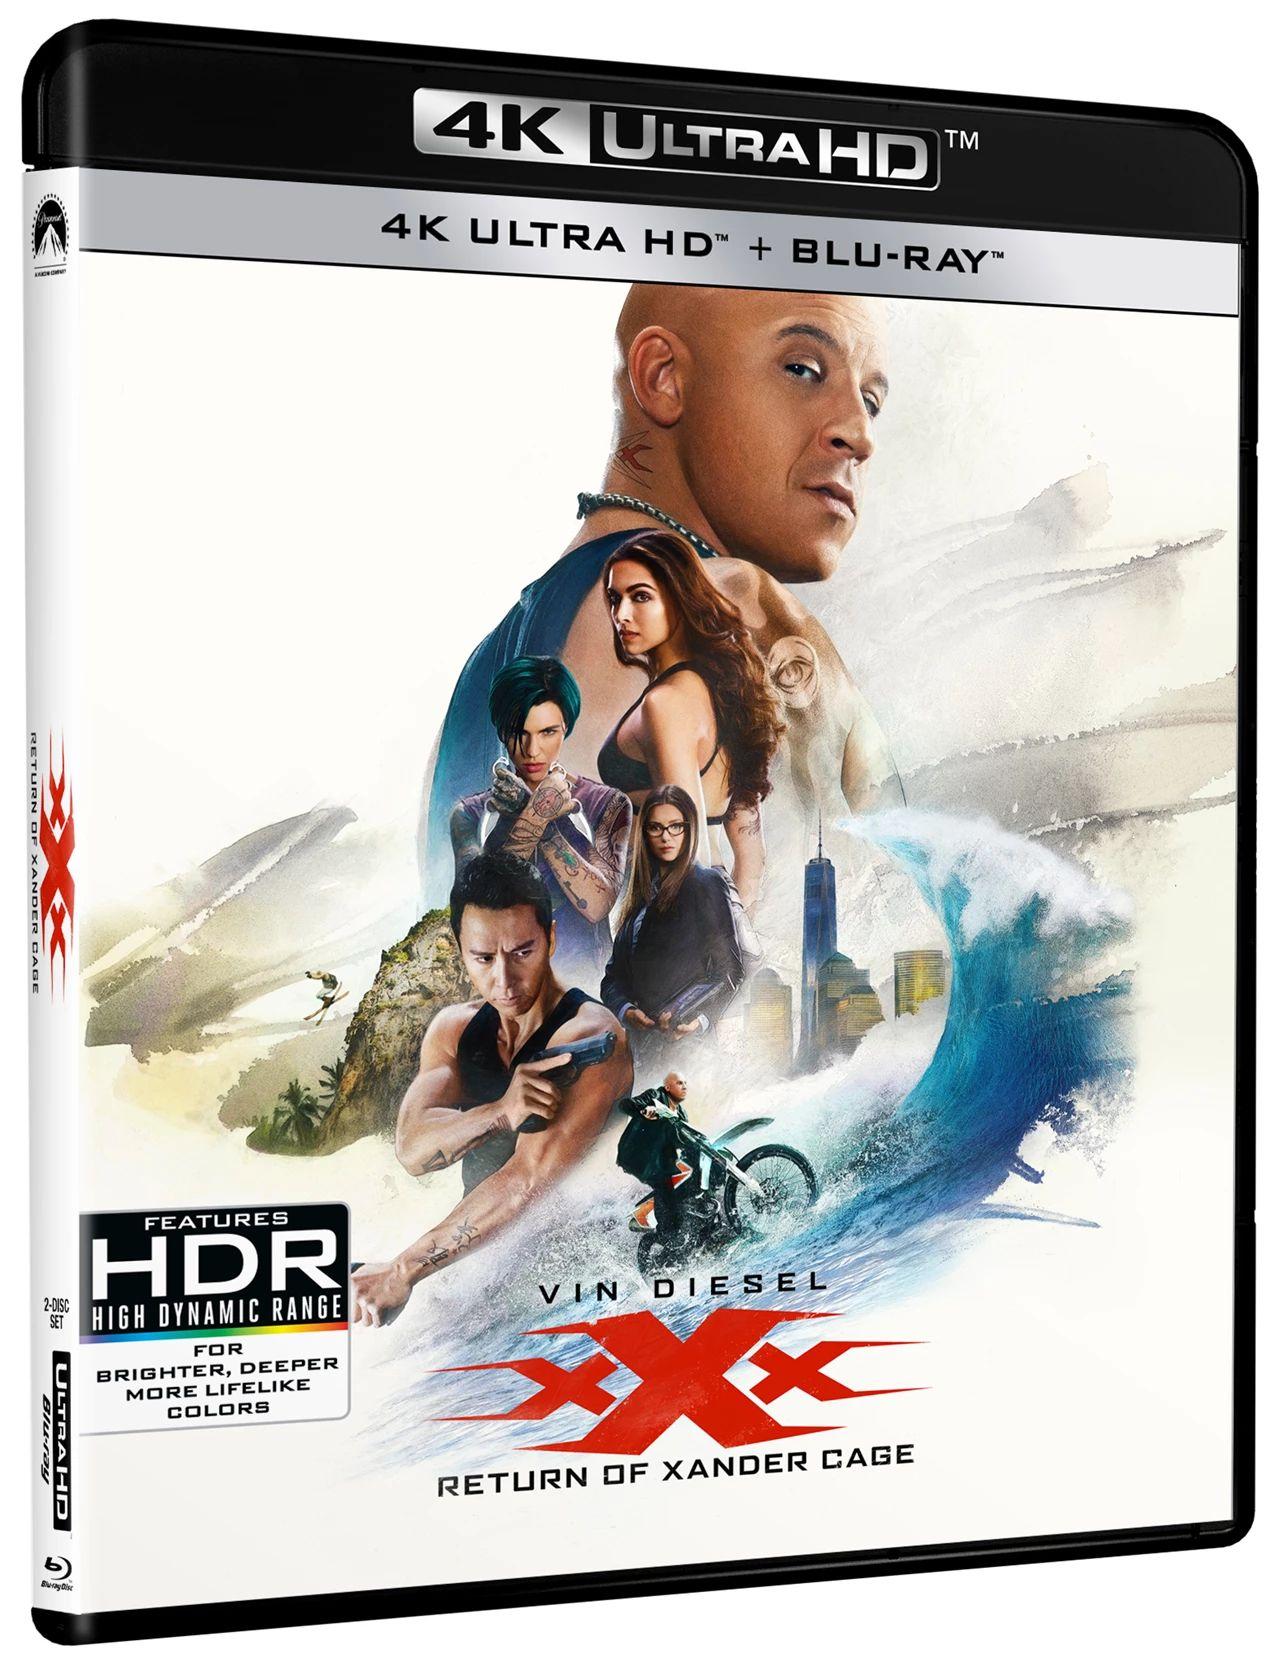 Xxx The Return Of Xander Cage 4K Uhd - Blu-ray - £3.45 @ Rarewaves